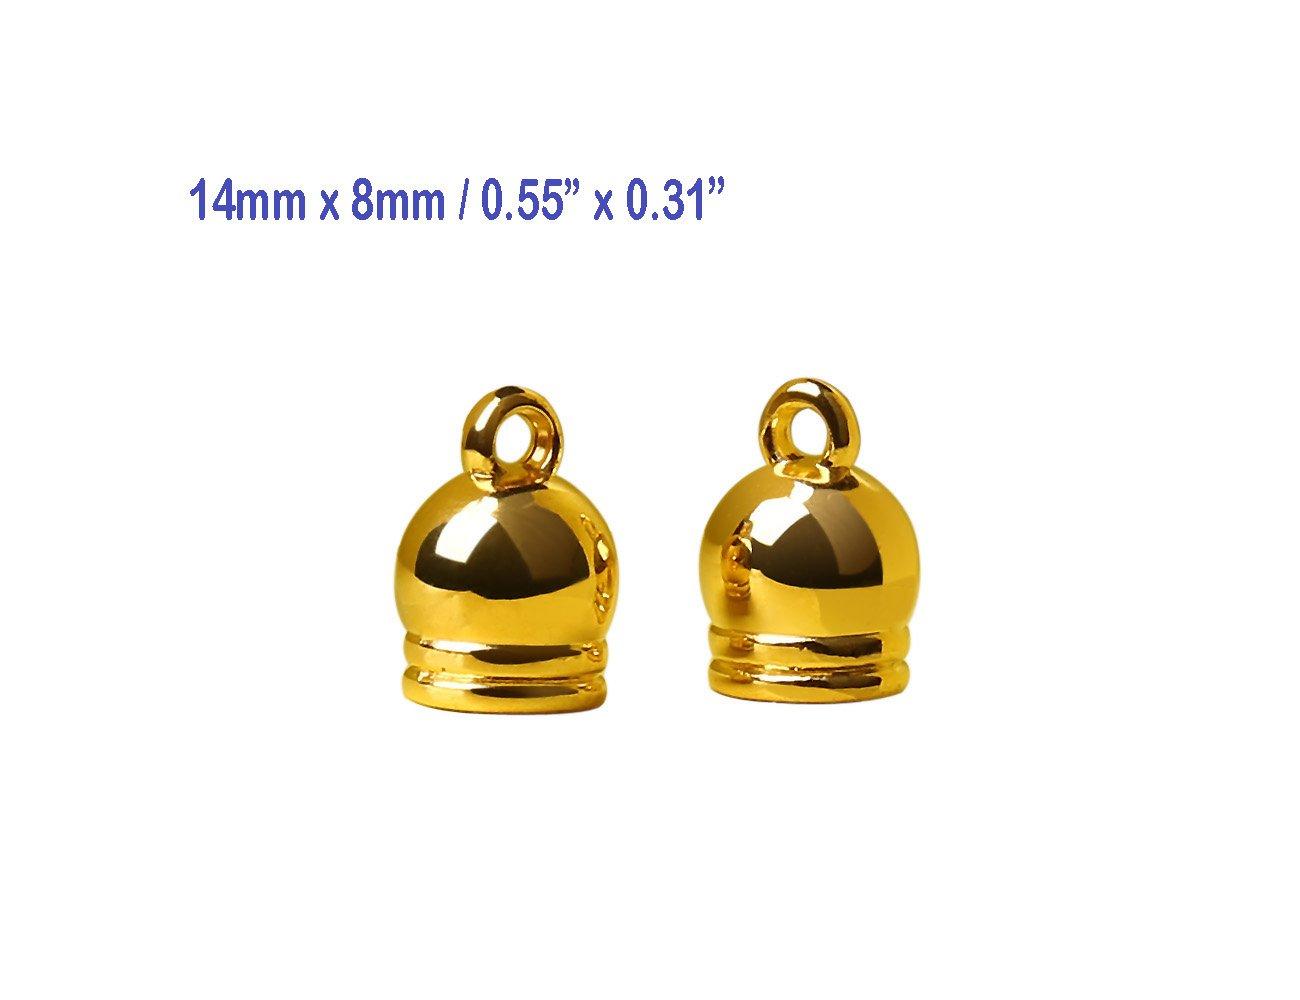 100 Pcs Tassels Accessories Charms Pendant, Tassels Tops, Tassels Caps Jewelry Findings #1546 (Gold)